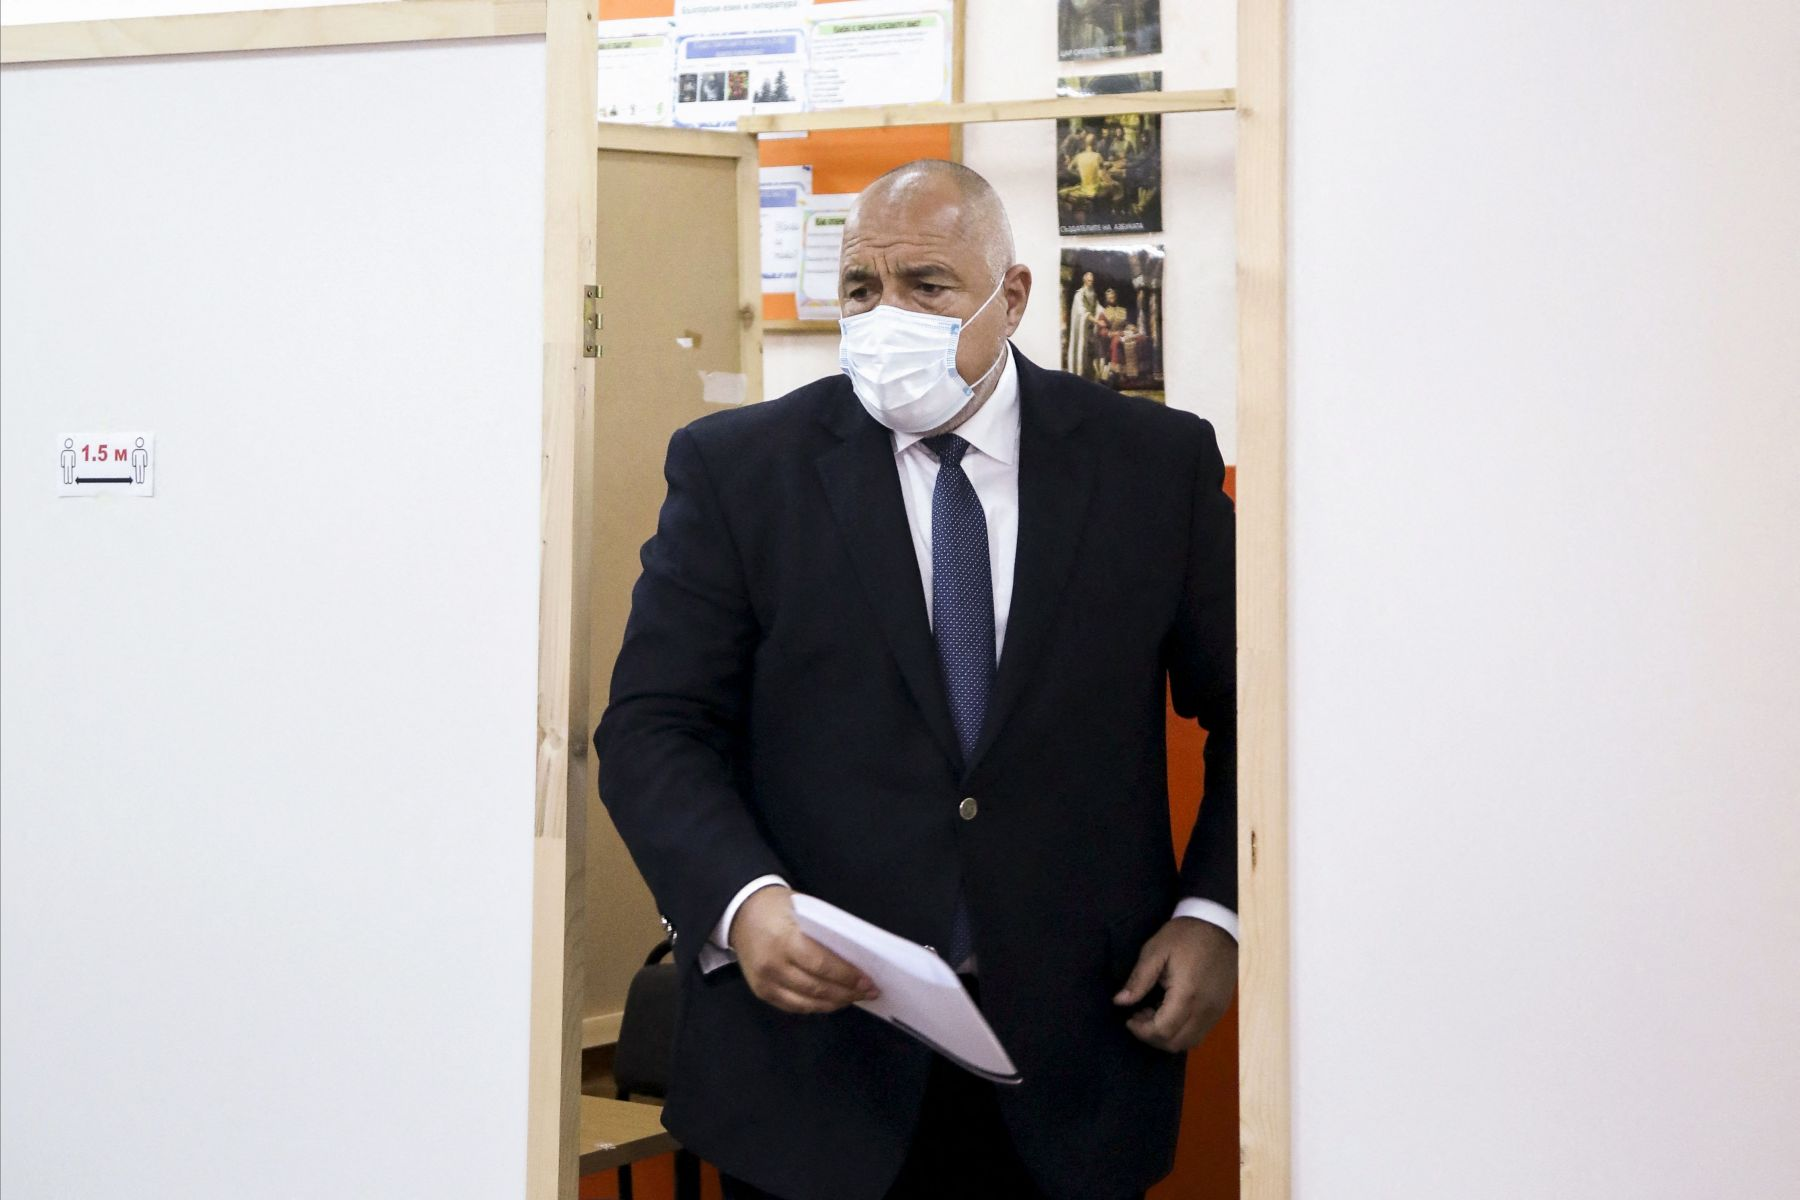 AFP/Handout / GERB Party Press Office